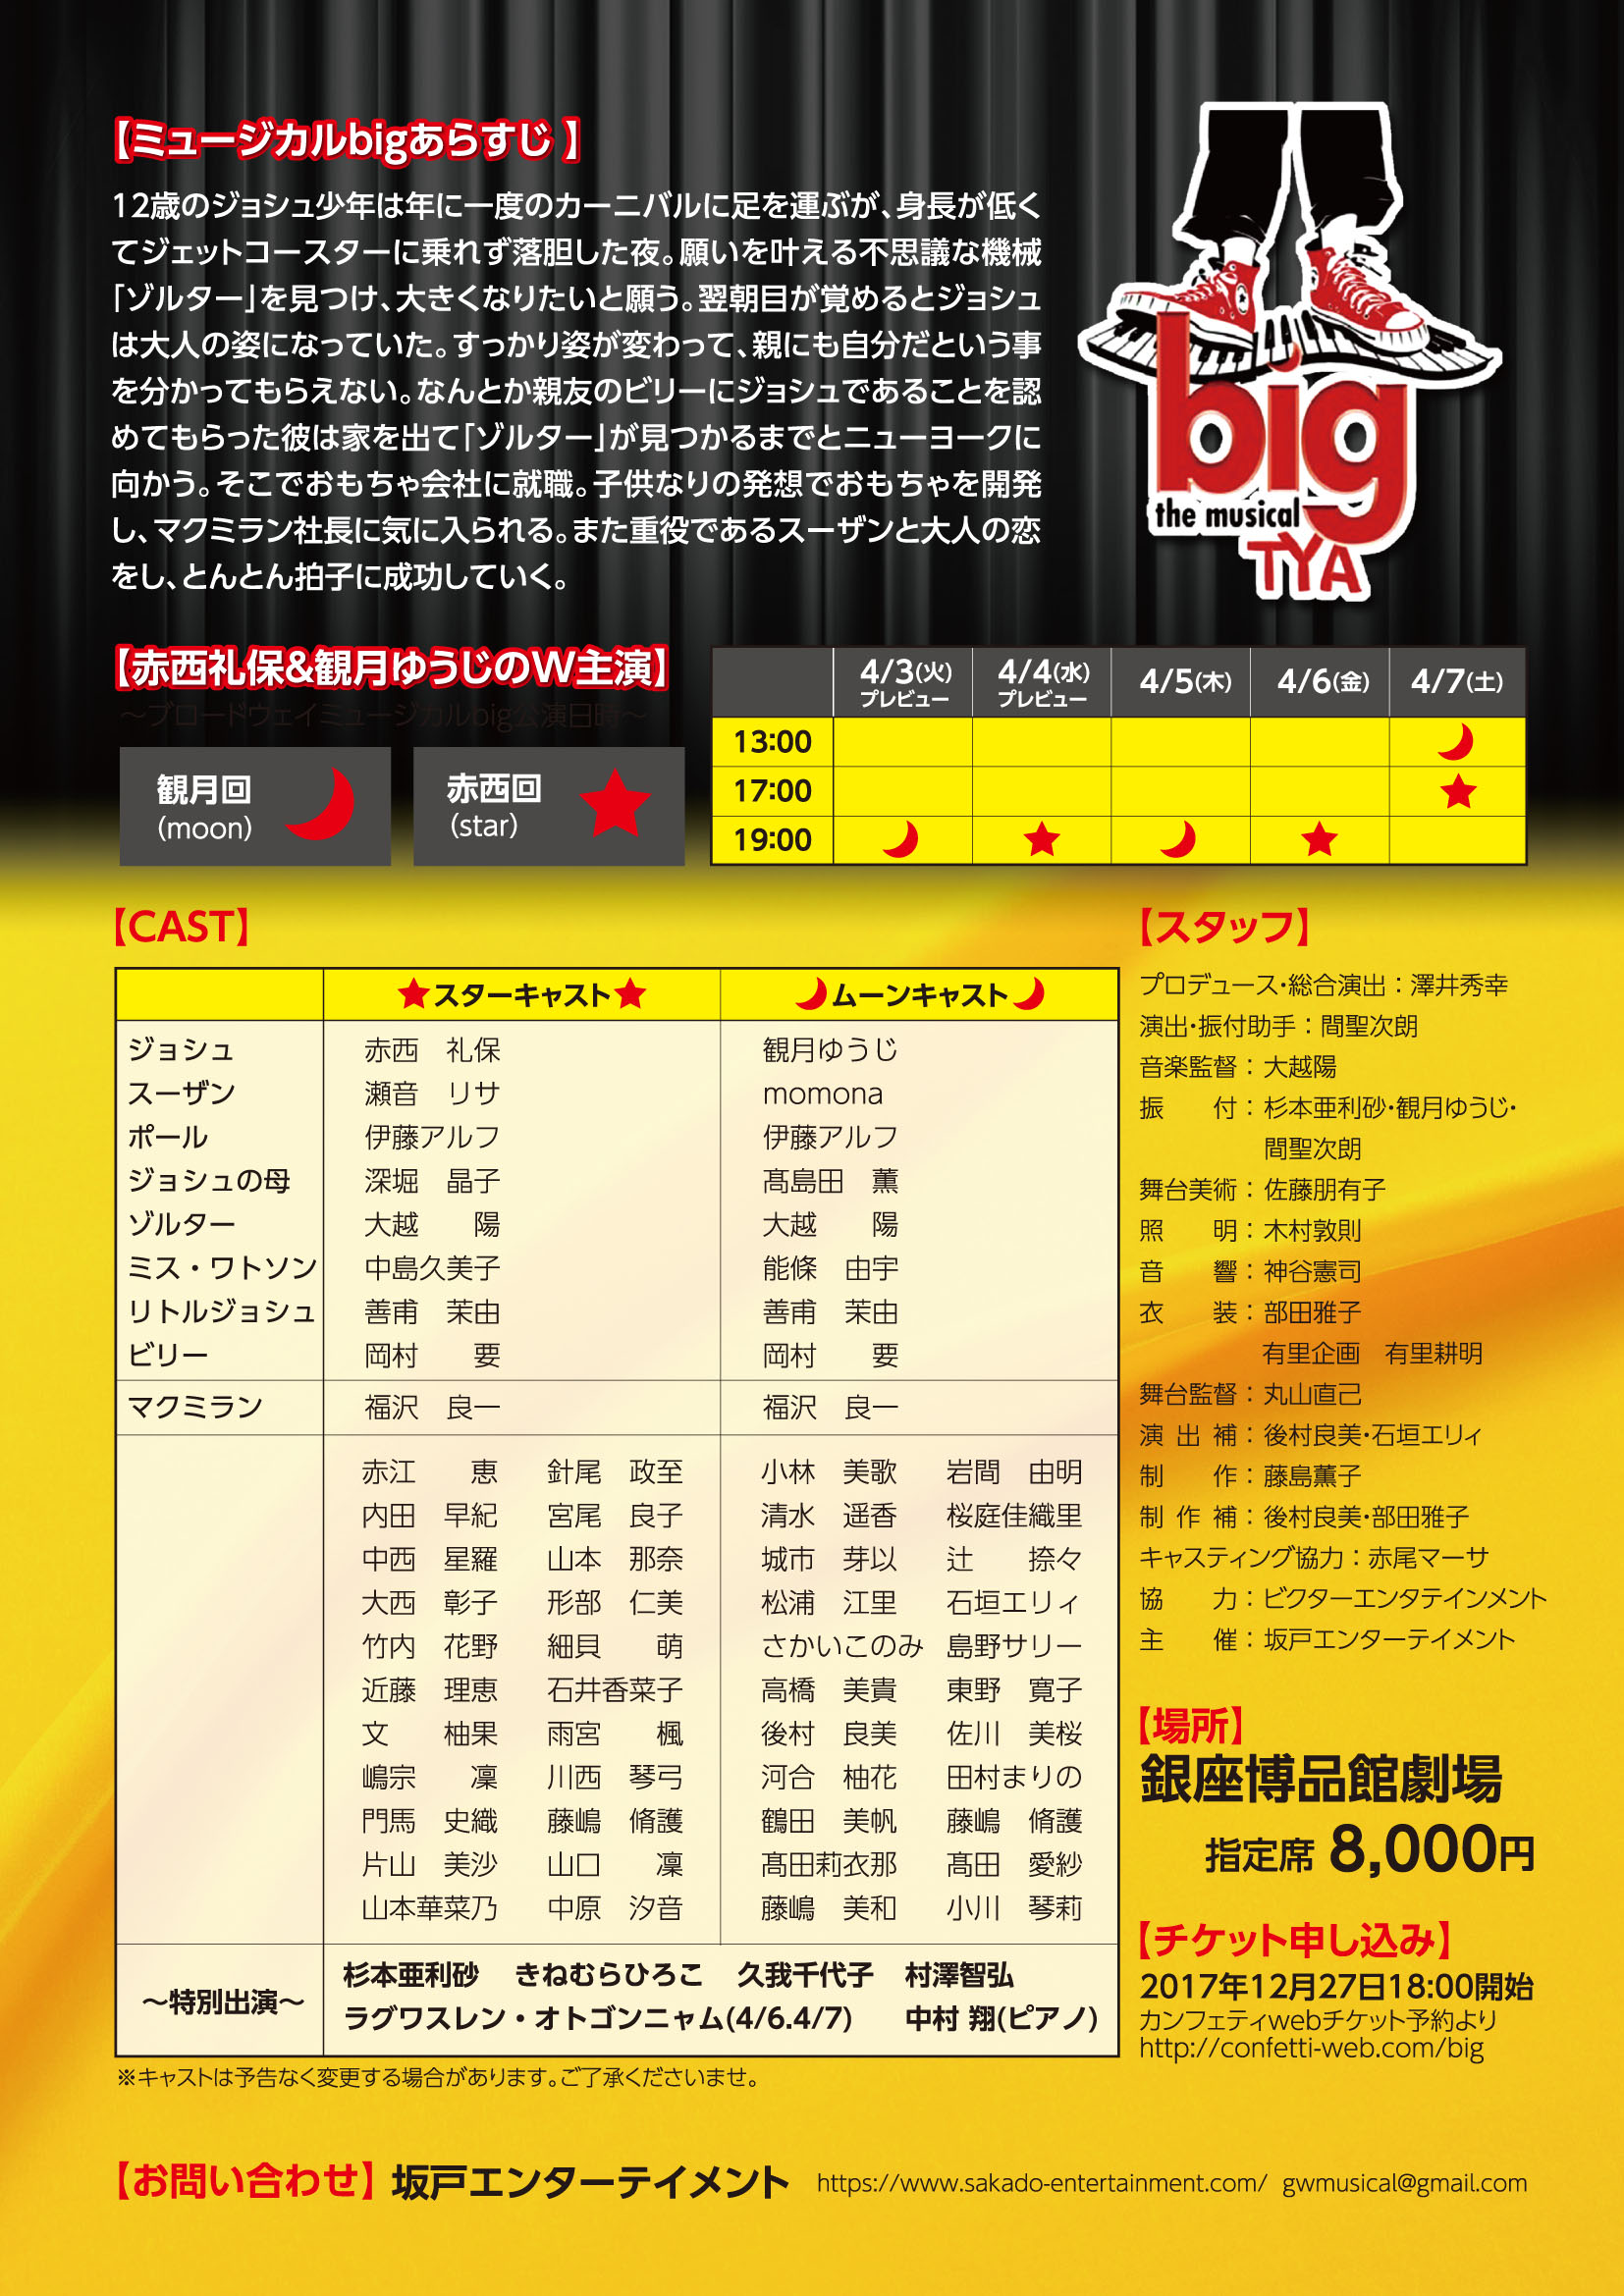 LE348_big_本チラシ_ura_A4_02ol